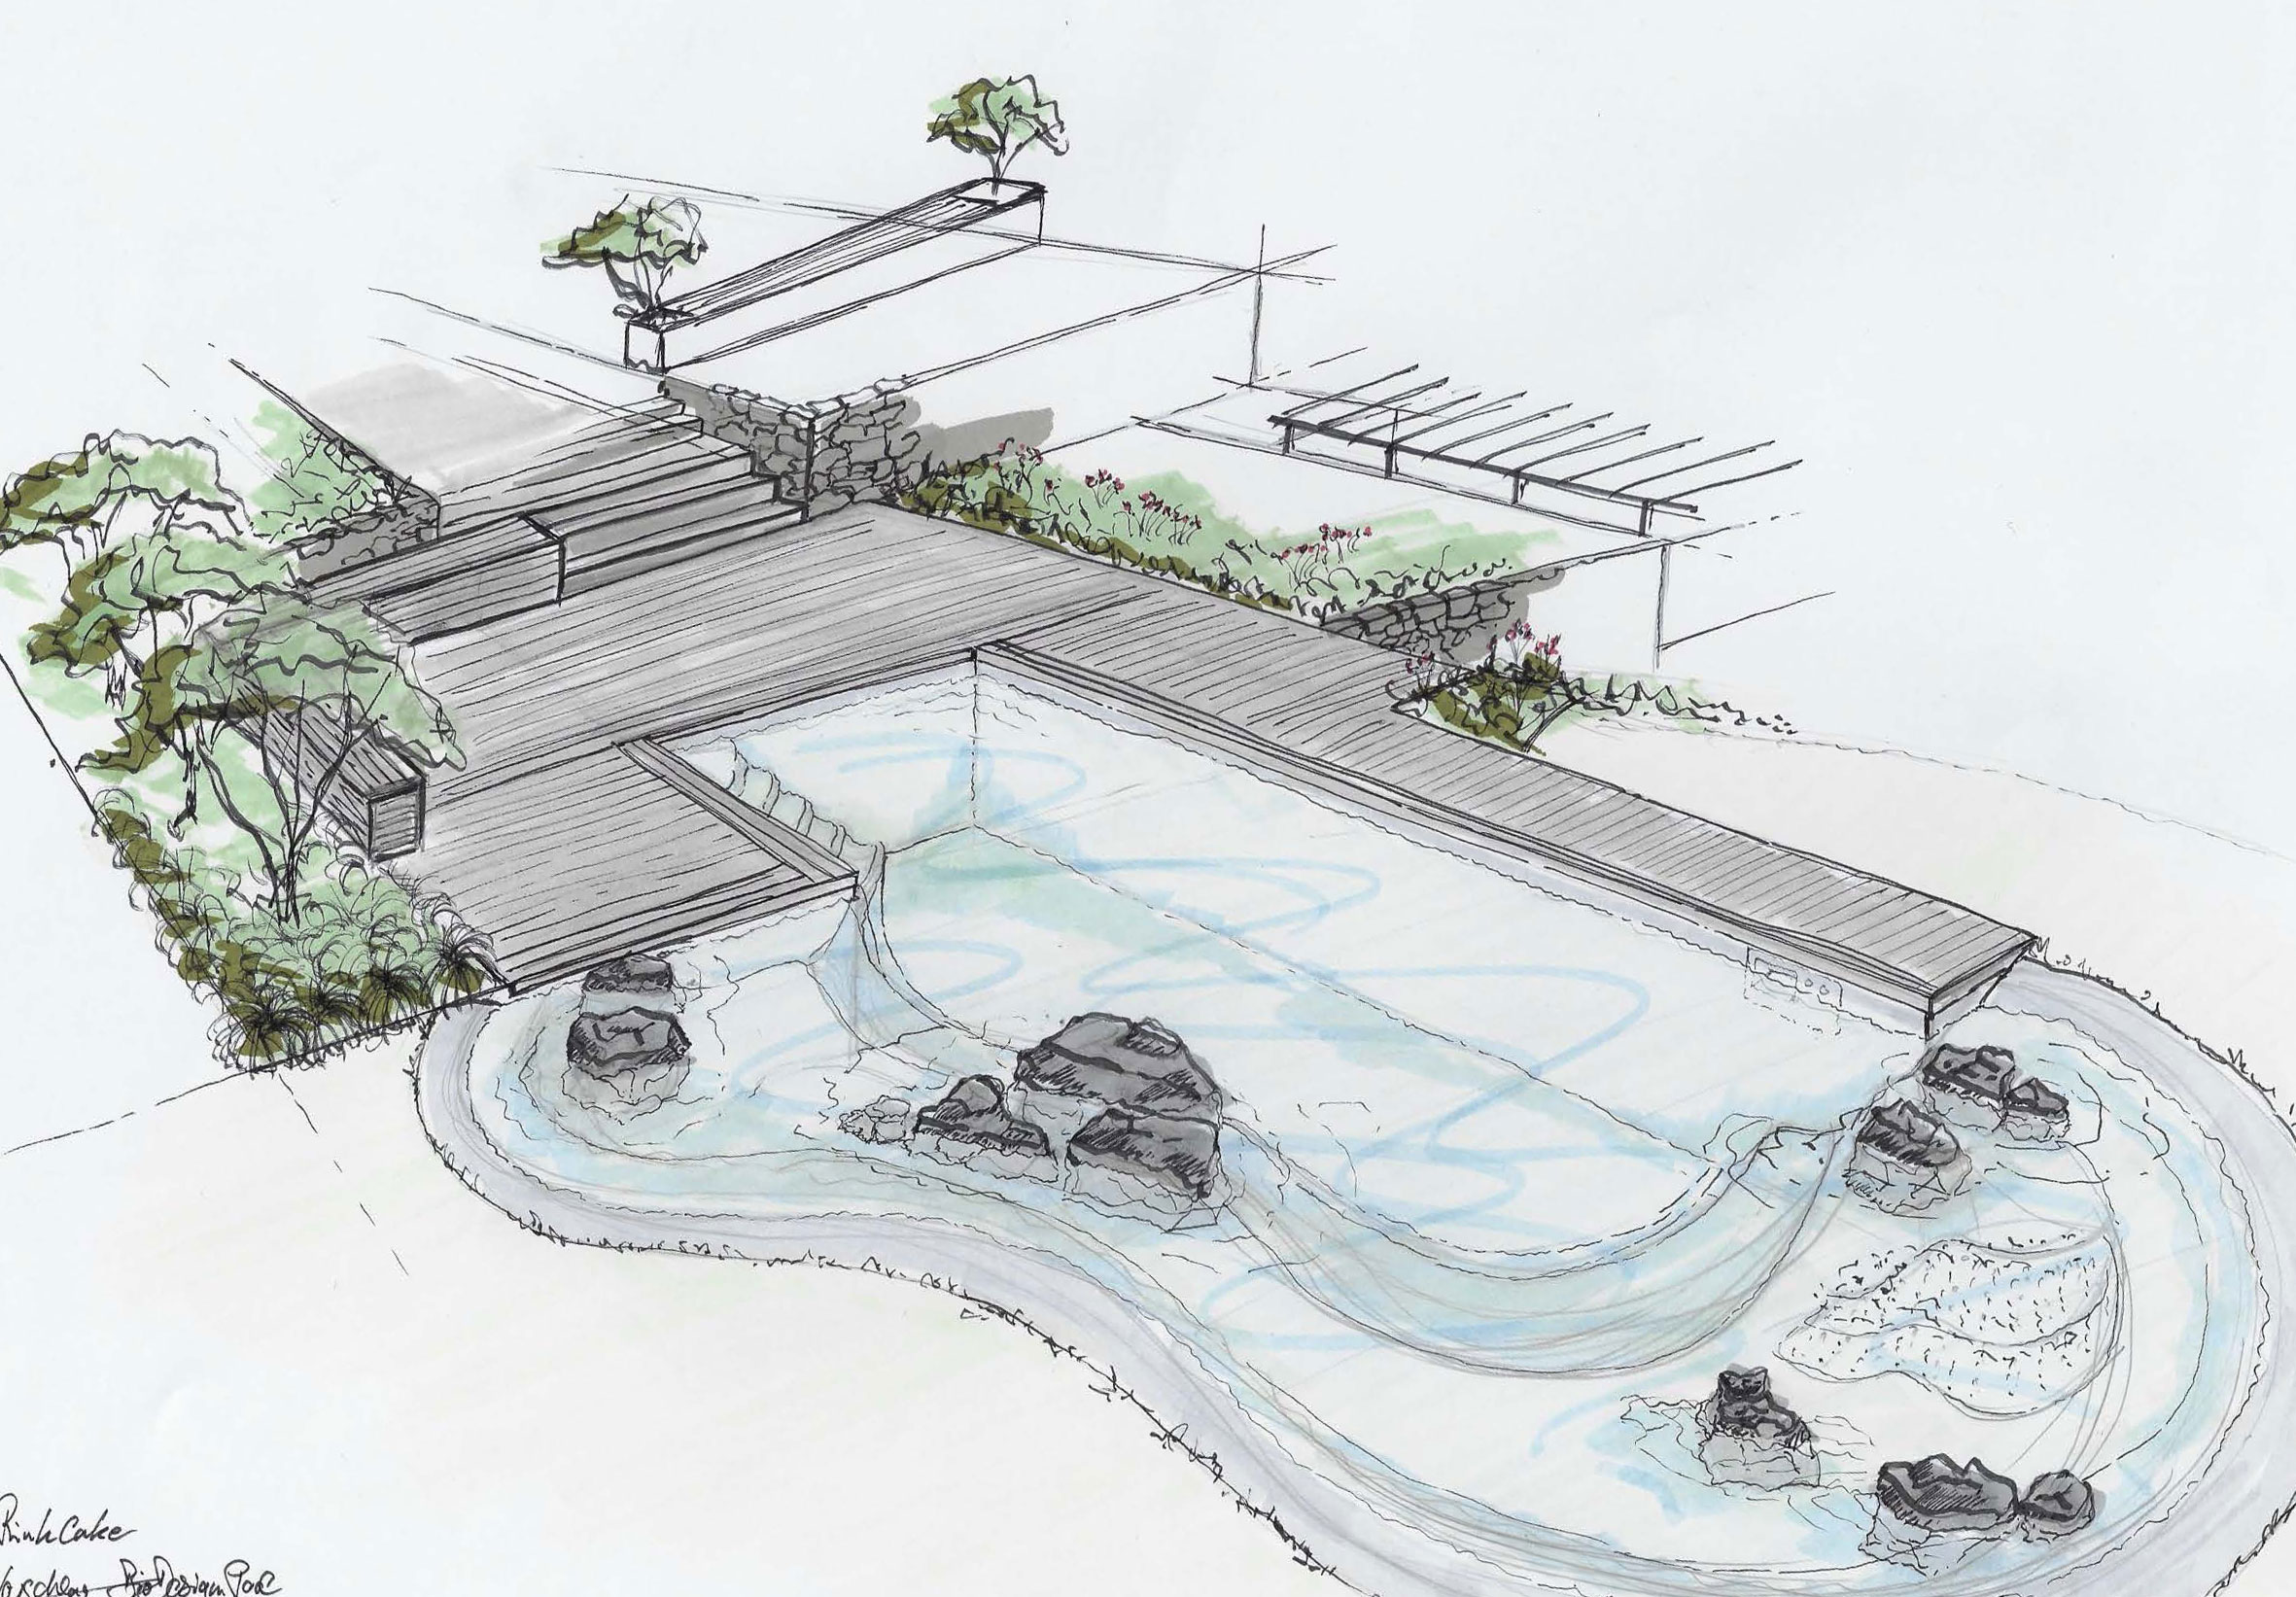 Rheingrün Biodesign Pool